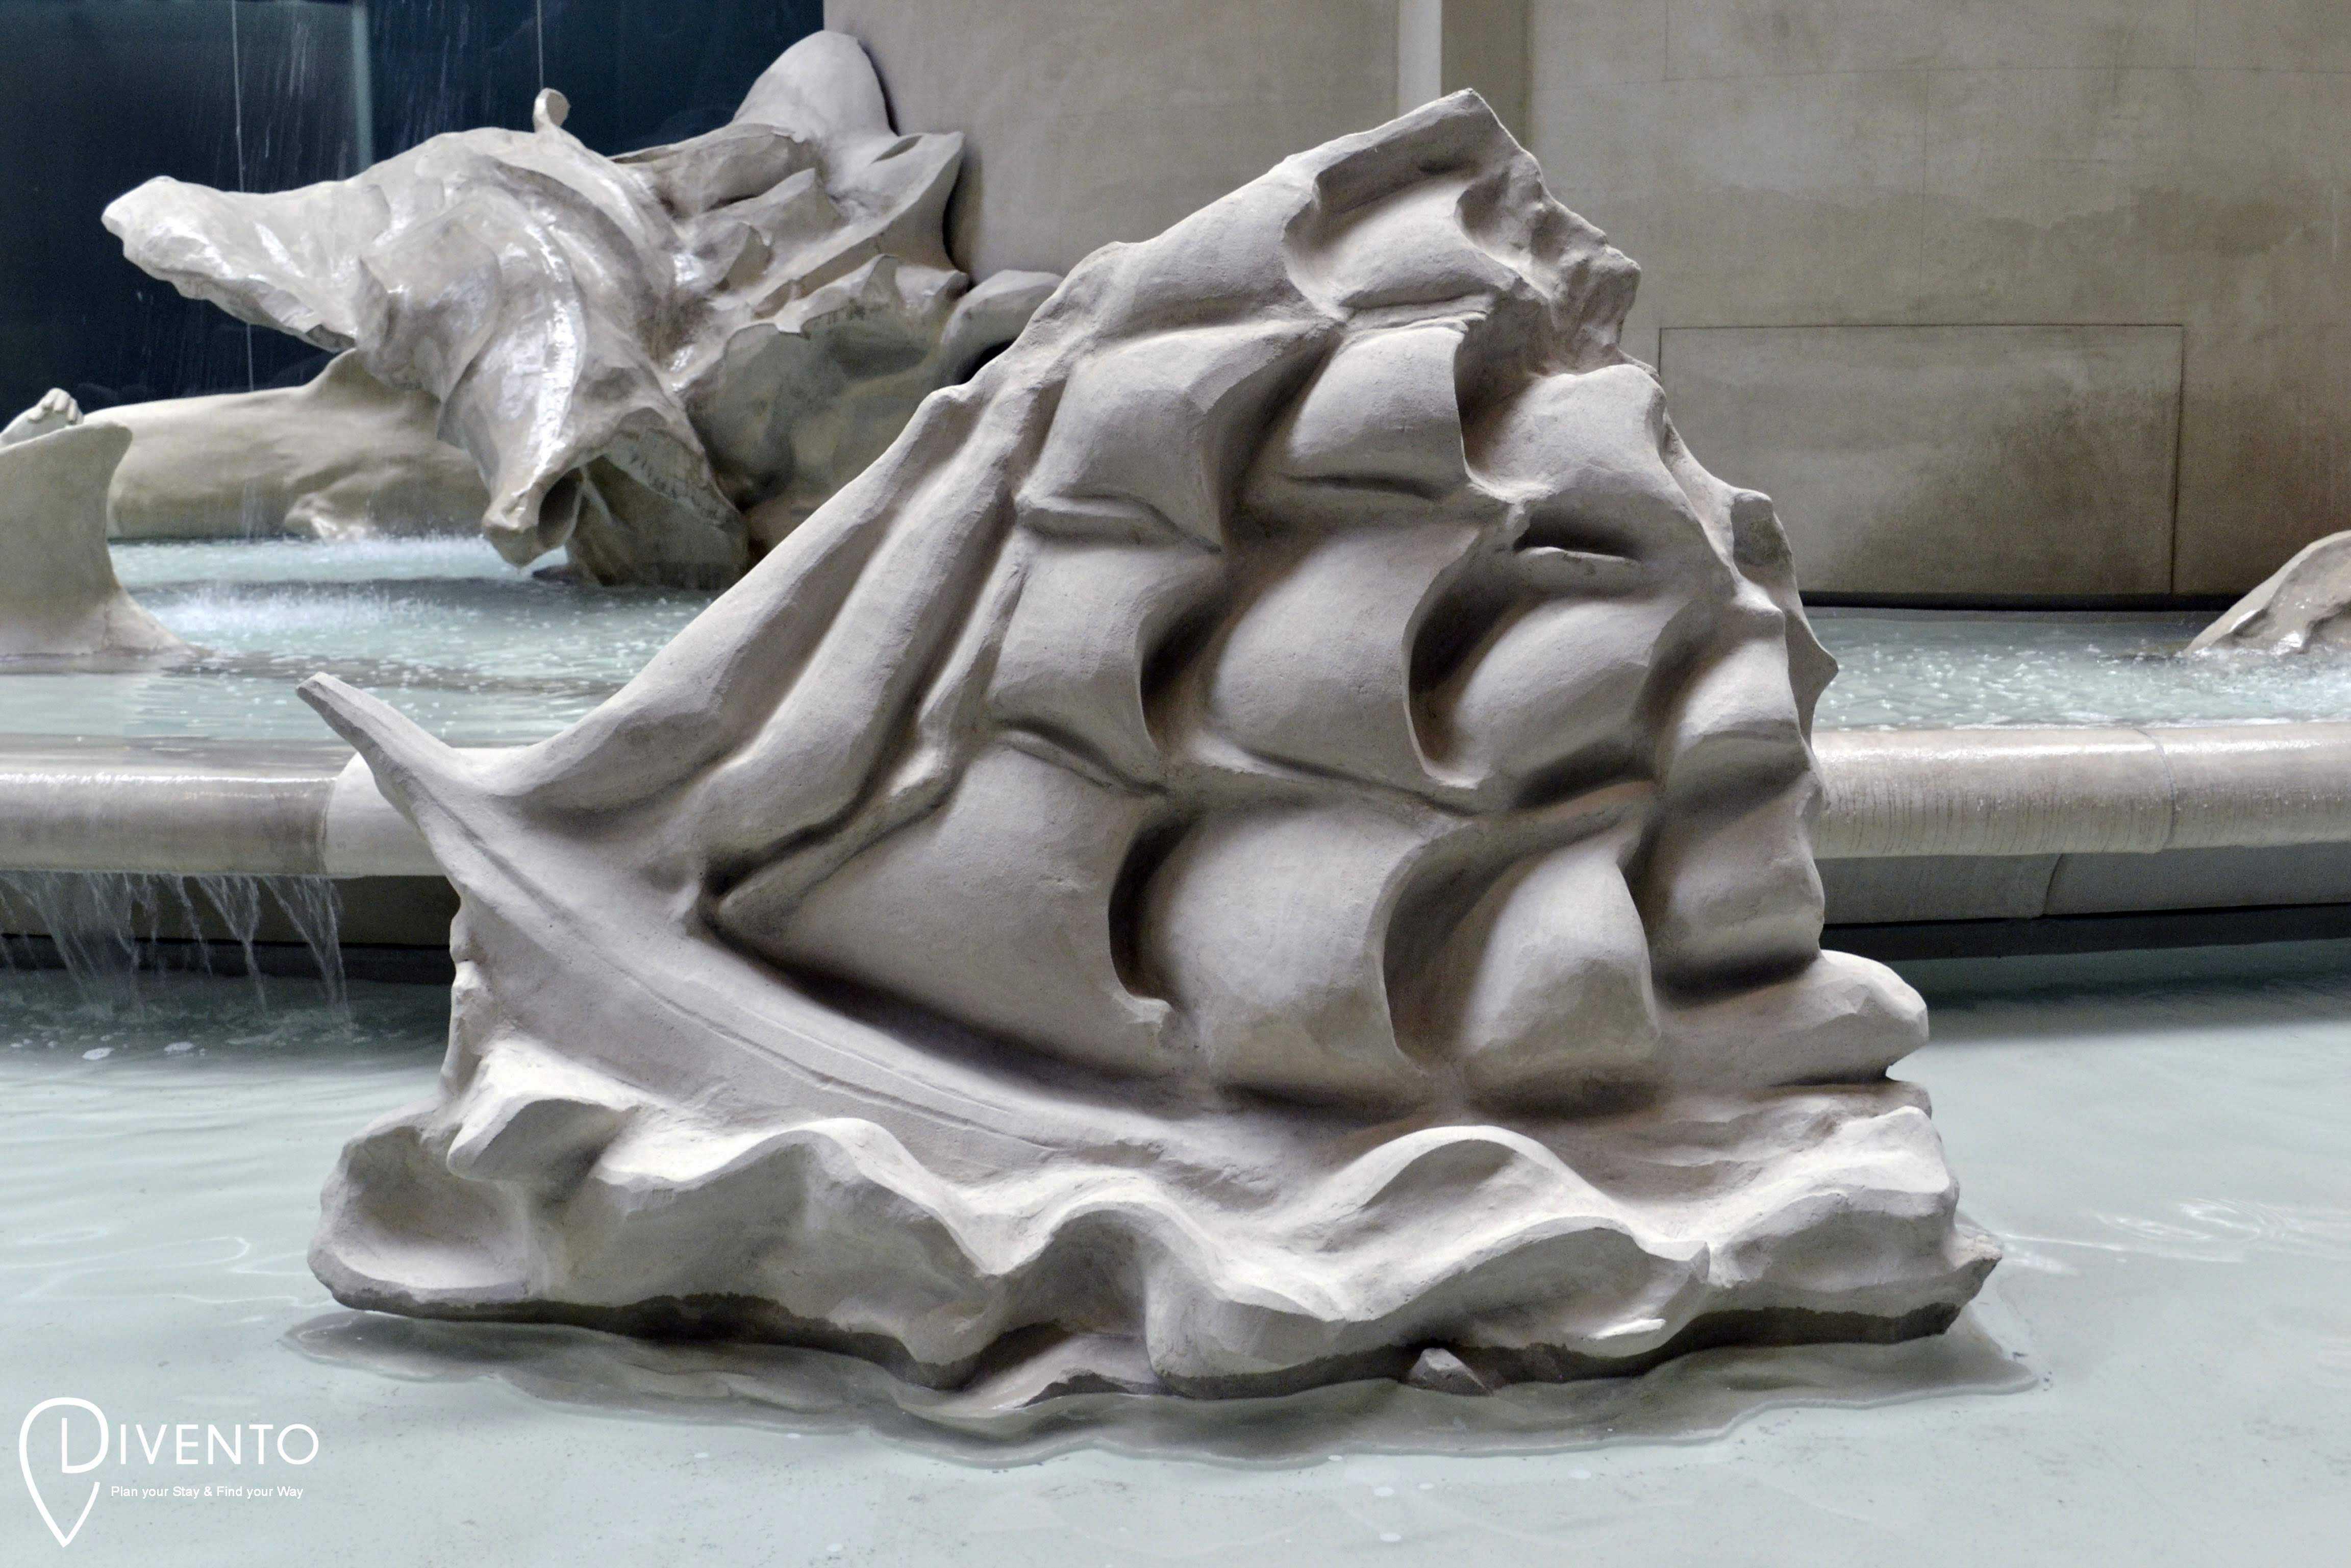 Hyundai Commission: Kara Walker, Tate Modern, London: 2 October 2019–5 April 2020